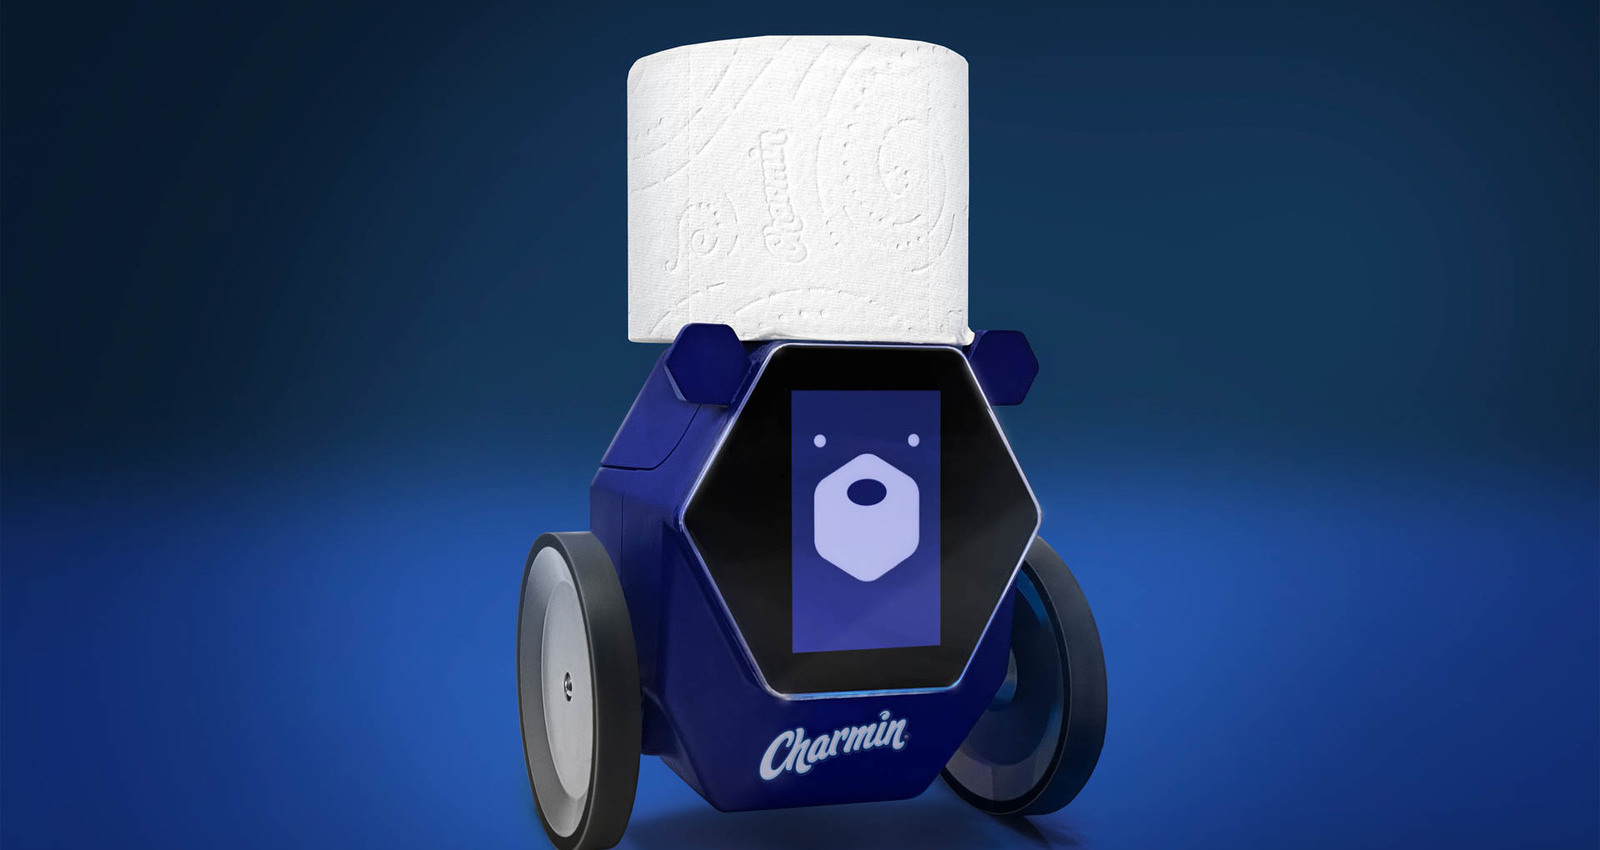 Charmin Toilet Tech Steals the Show at CES 2020